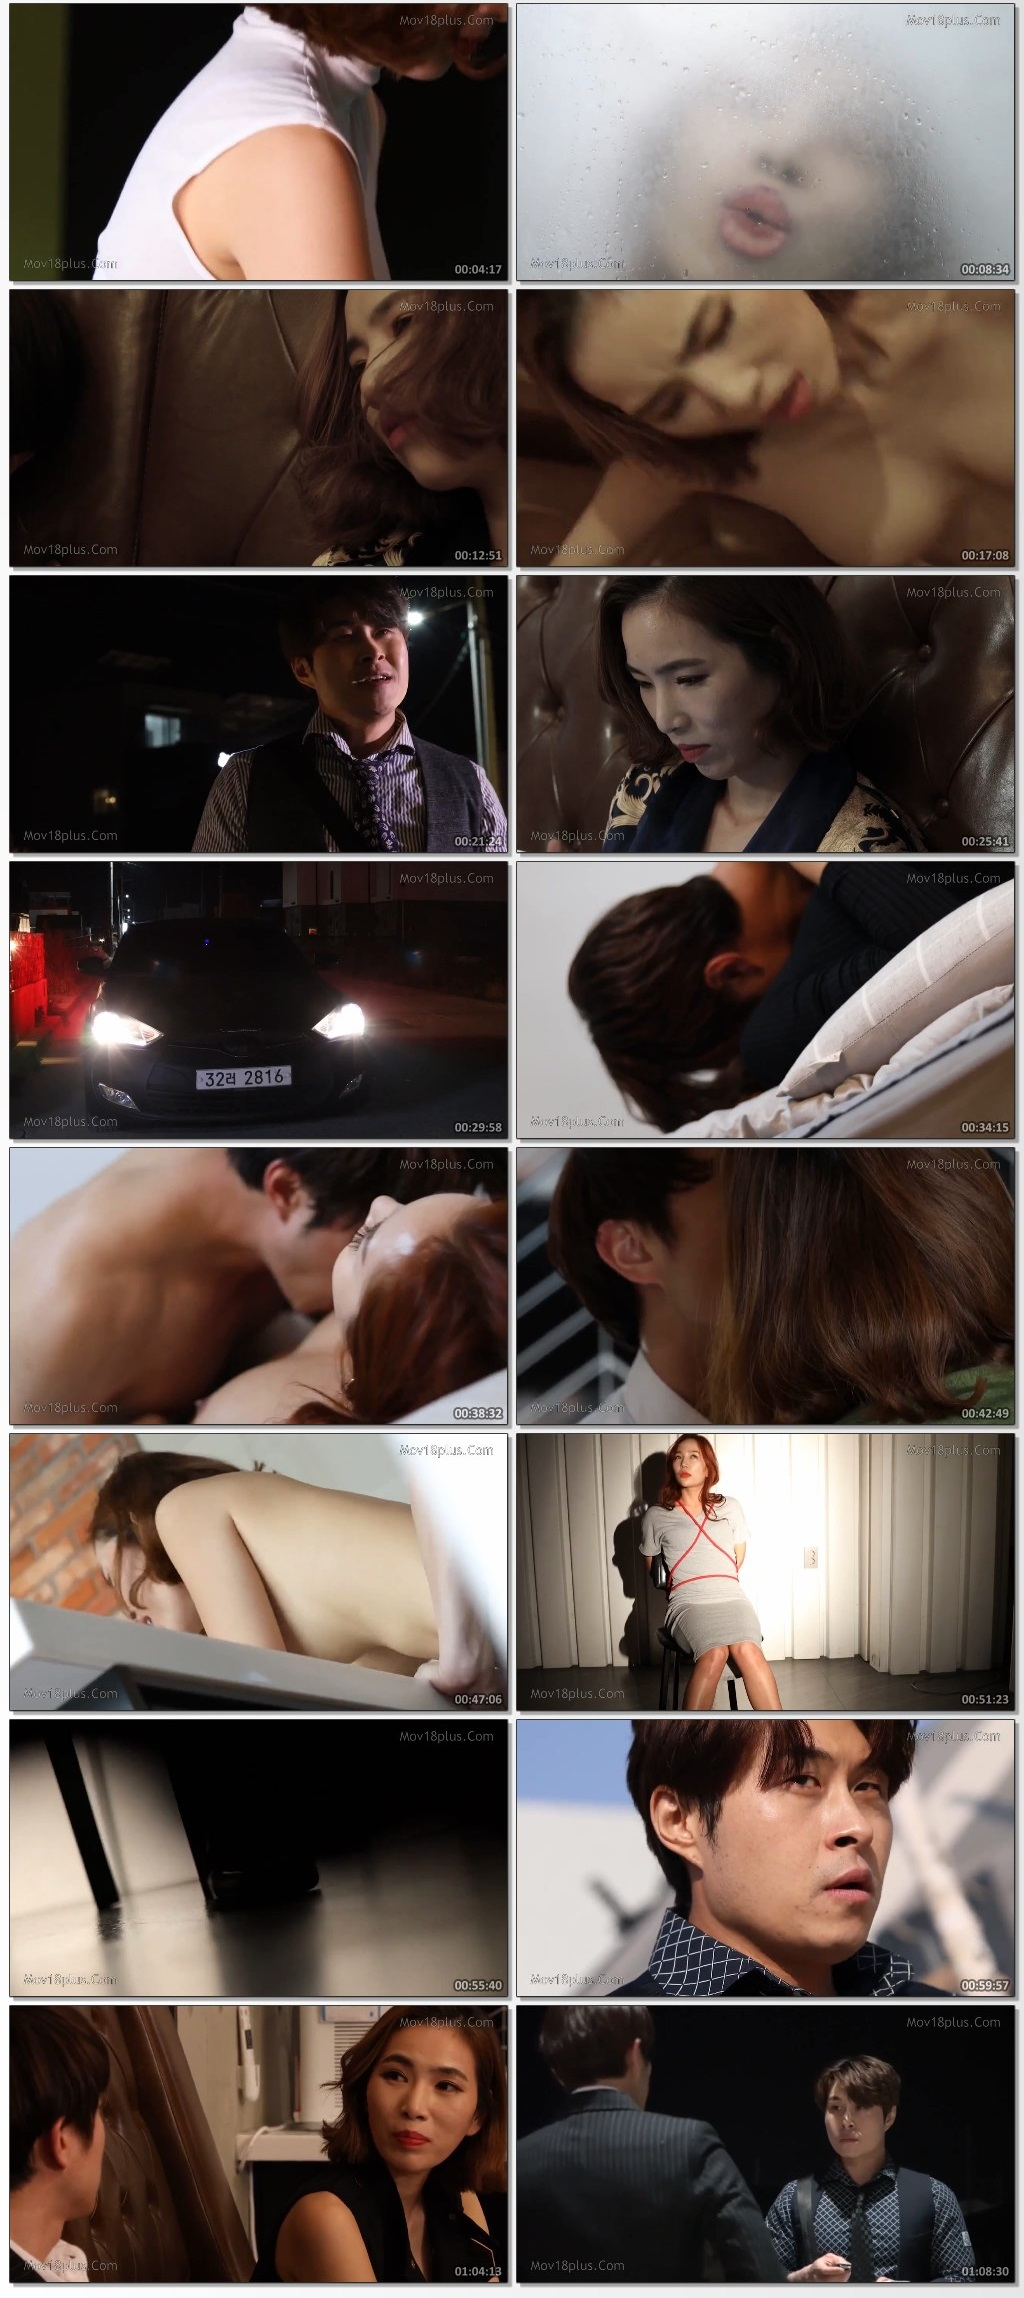 Perfect-woman-2021-filmguro-sitel-Korean-Movie-720p-HDRip-600-MB-mkv-thumbs